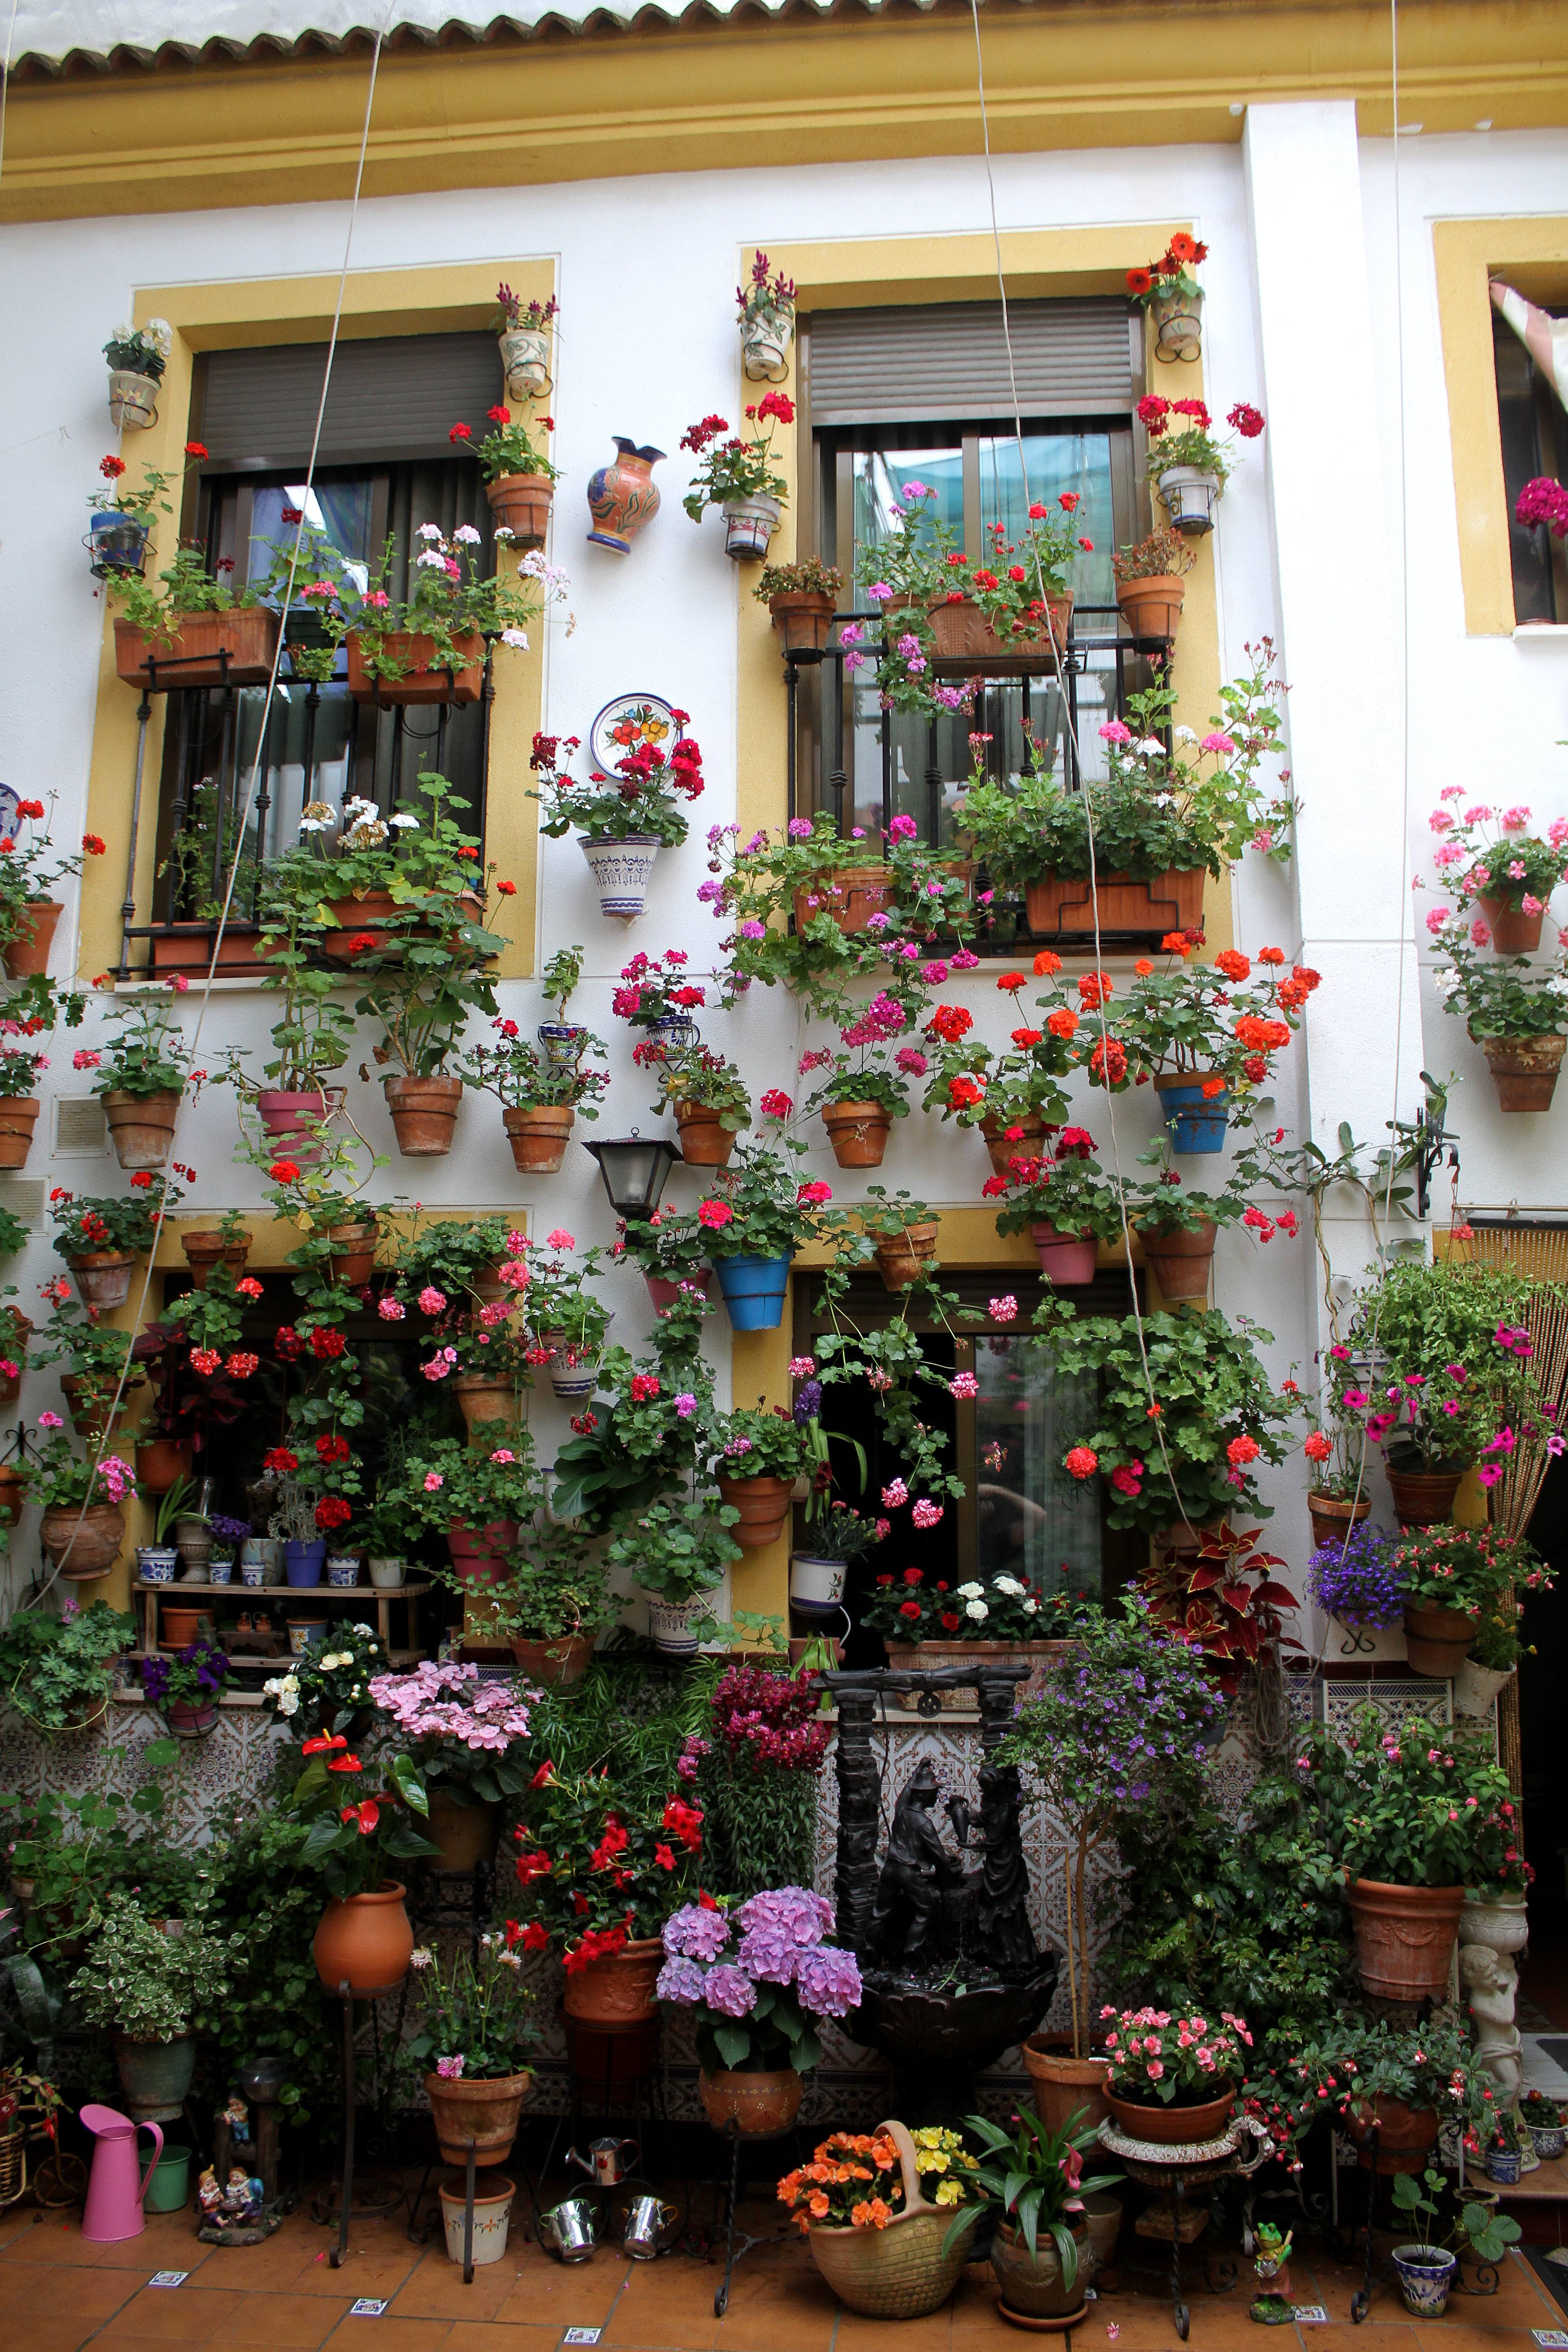 Festival de los patios cordobeses wikipedia la - Patios interiores andaluces ...